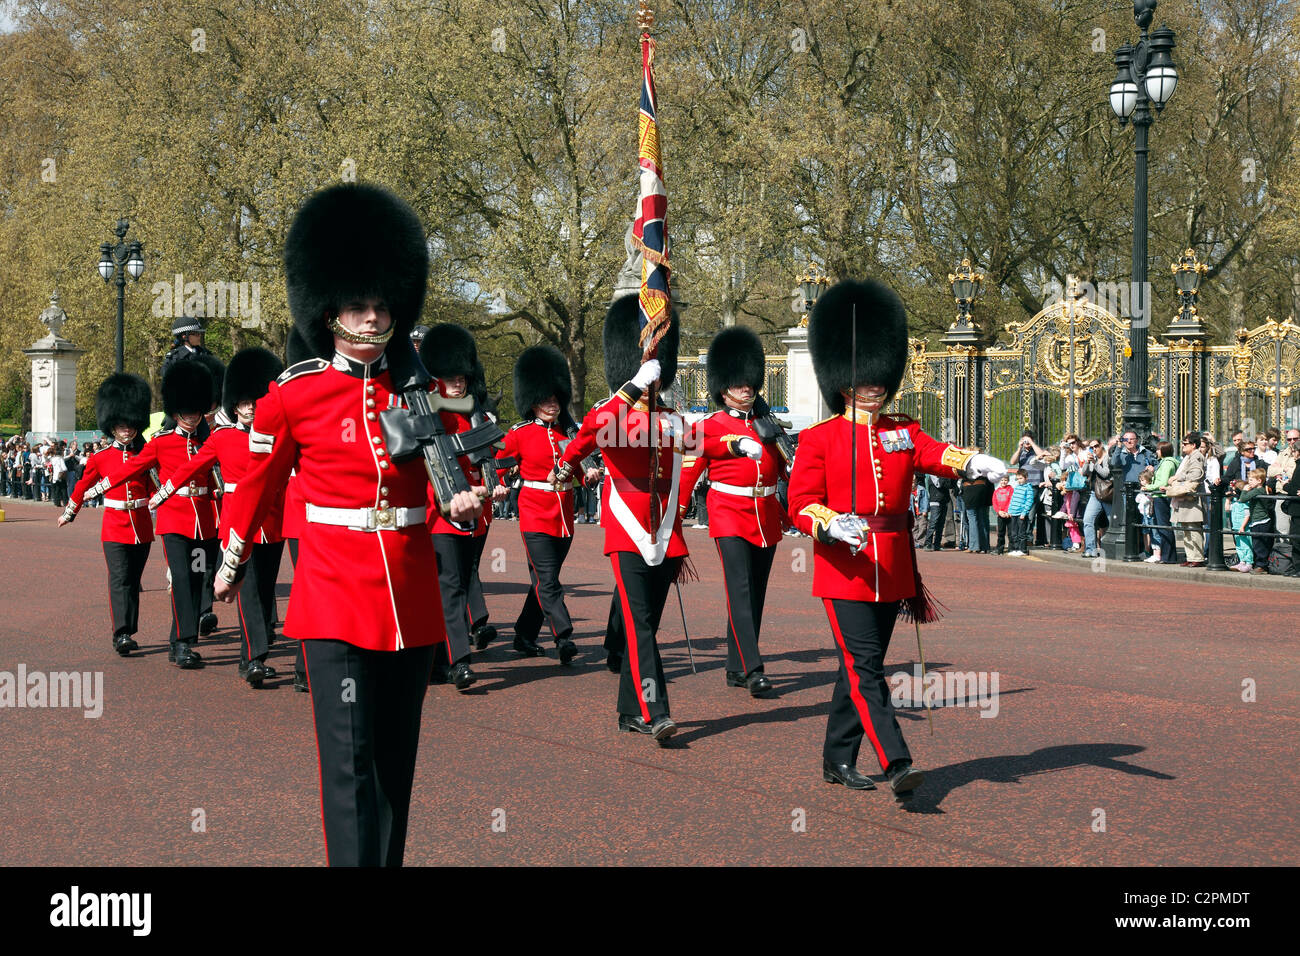 Granatiere Guardia a Buckingham Palace Immagini Stock